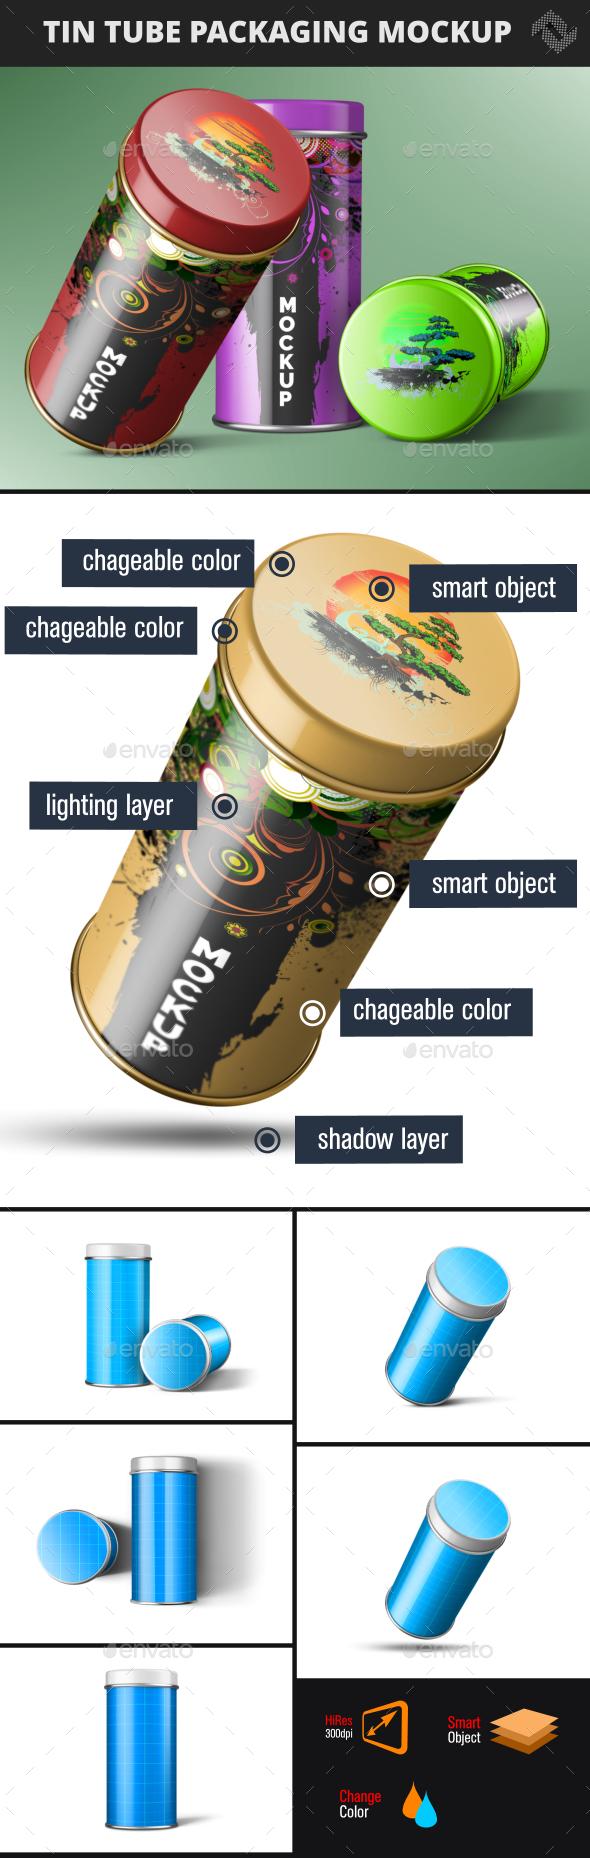 Tin Tube Can Mockup - Product Mock-Ups Graphics